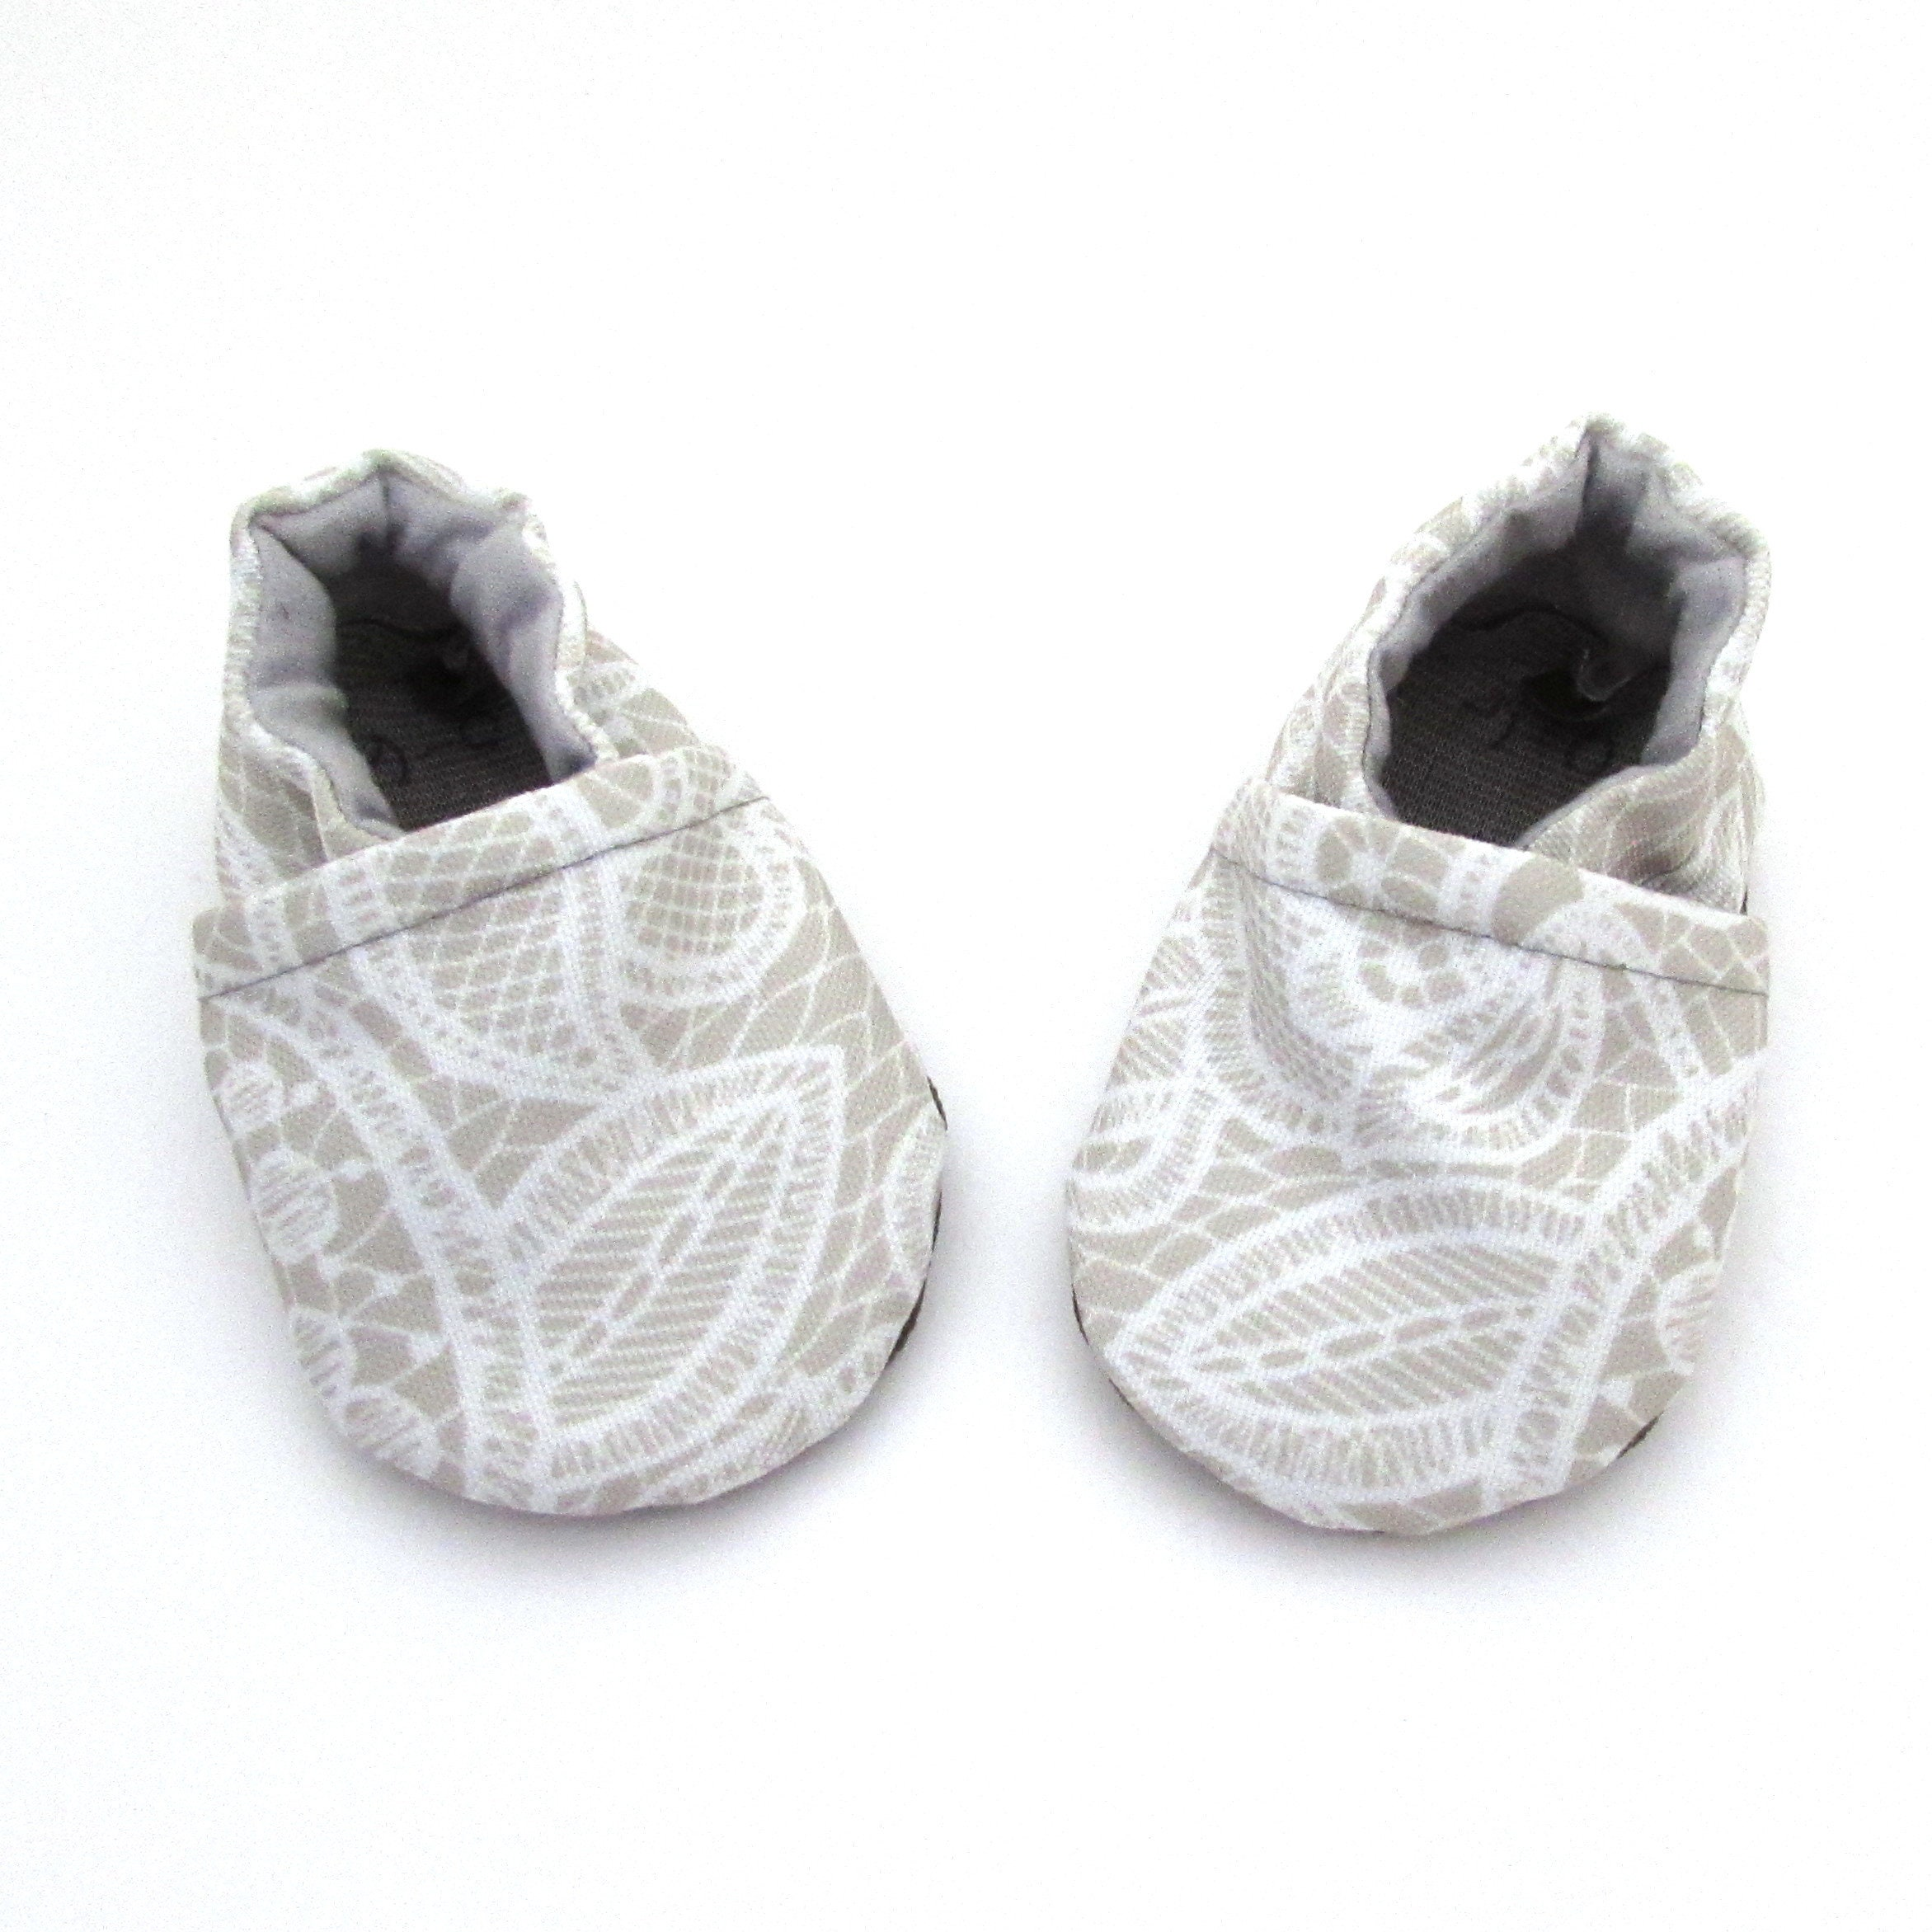 c285a43f14f0 Lace Print Eco-Canvas Baby Shoes    Cream White Eco-Friendly